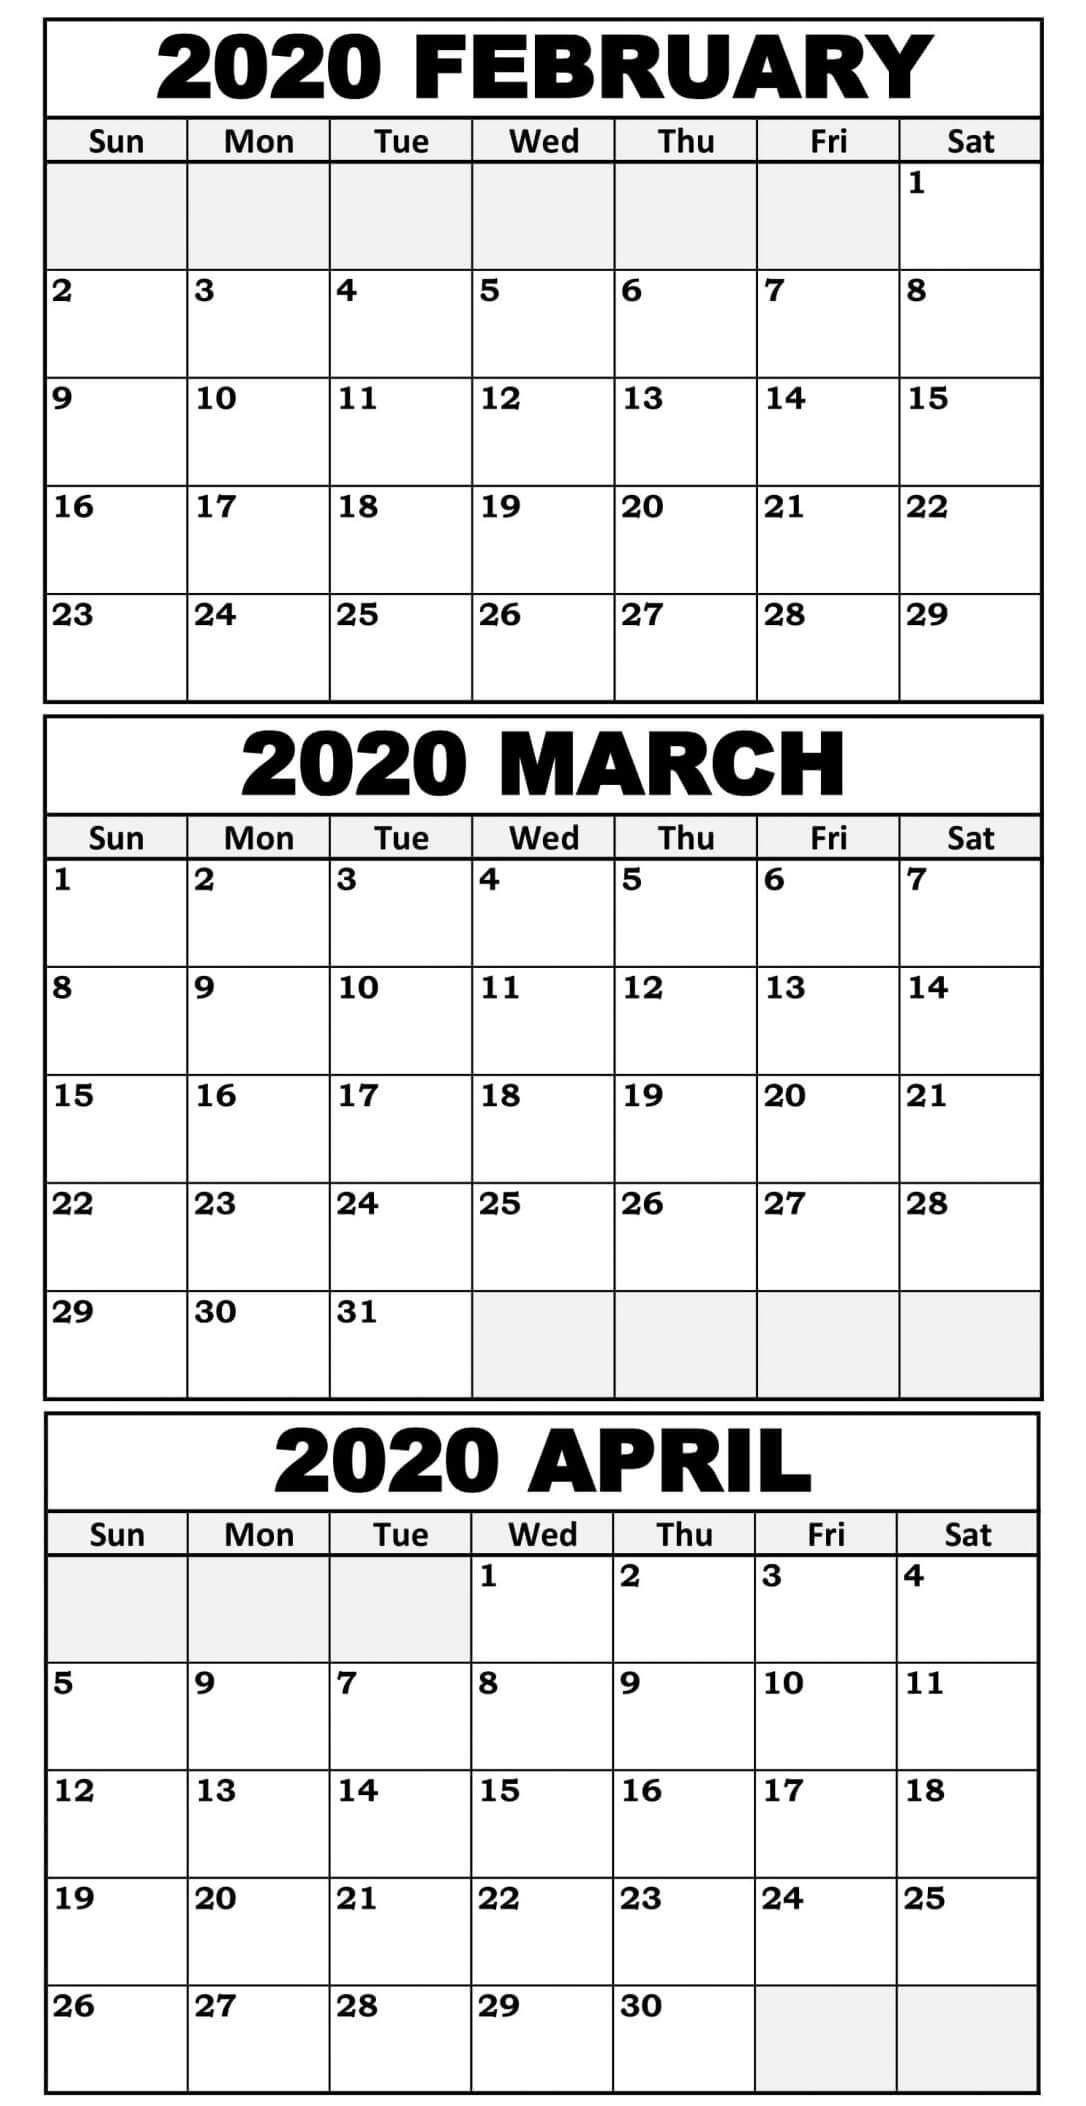 3 Month Calendar Printable 2020 | Calendar For Planning within 3 Month Blank Calendar Template